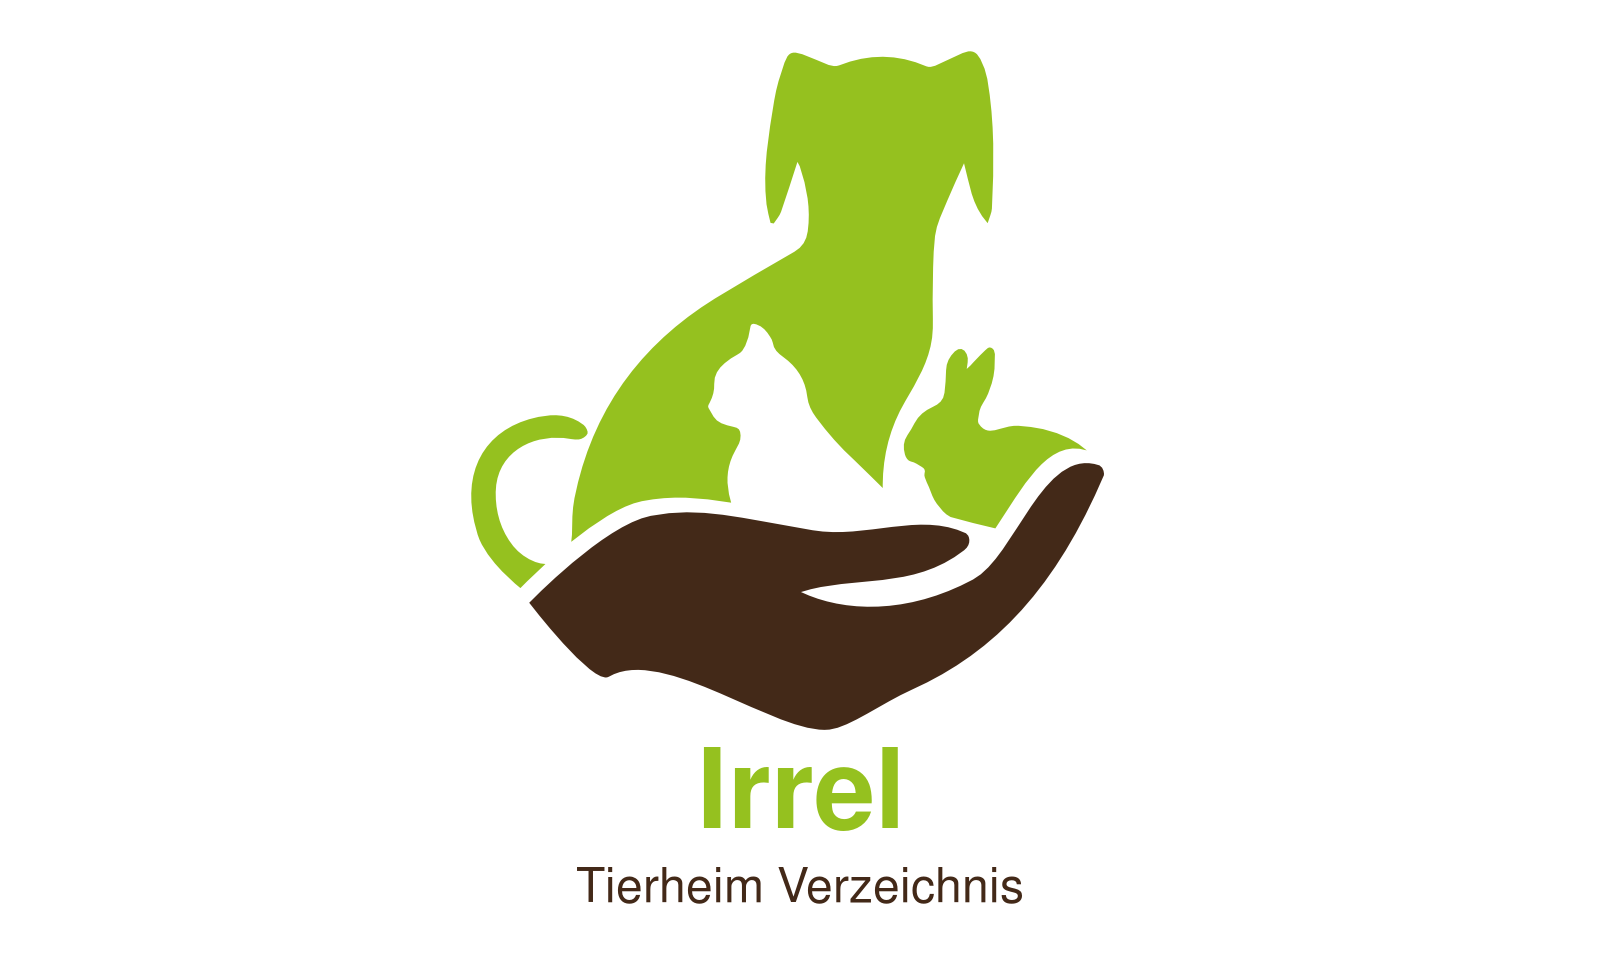 Tierheim Irrel